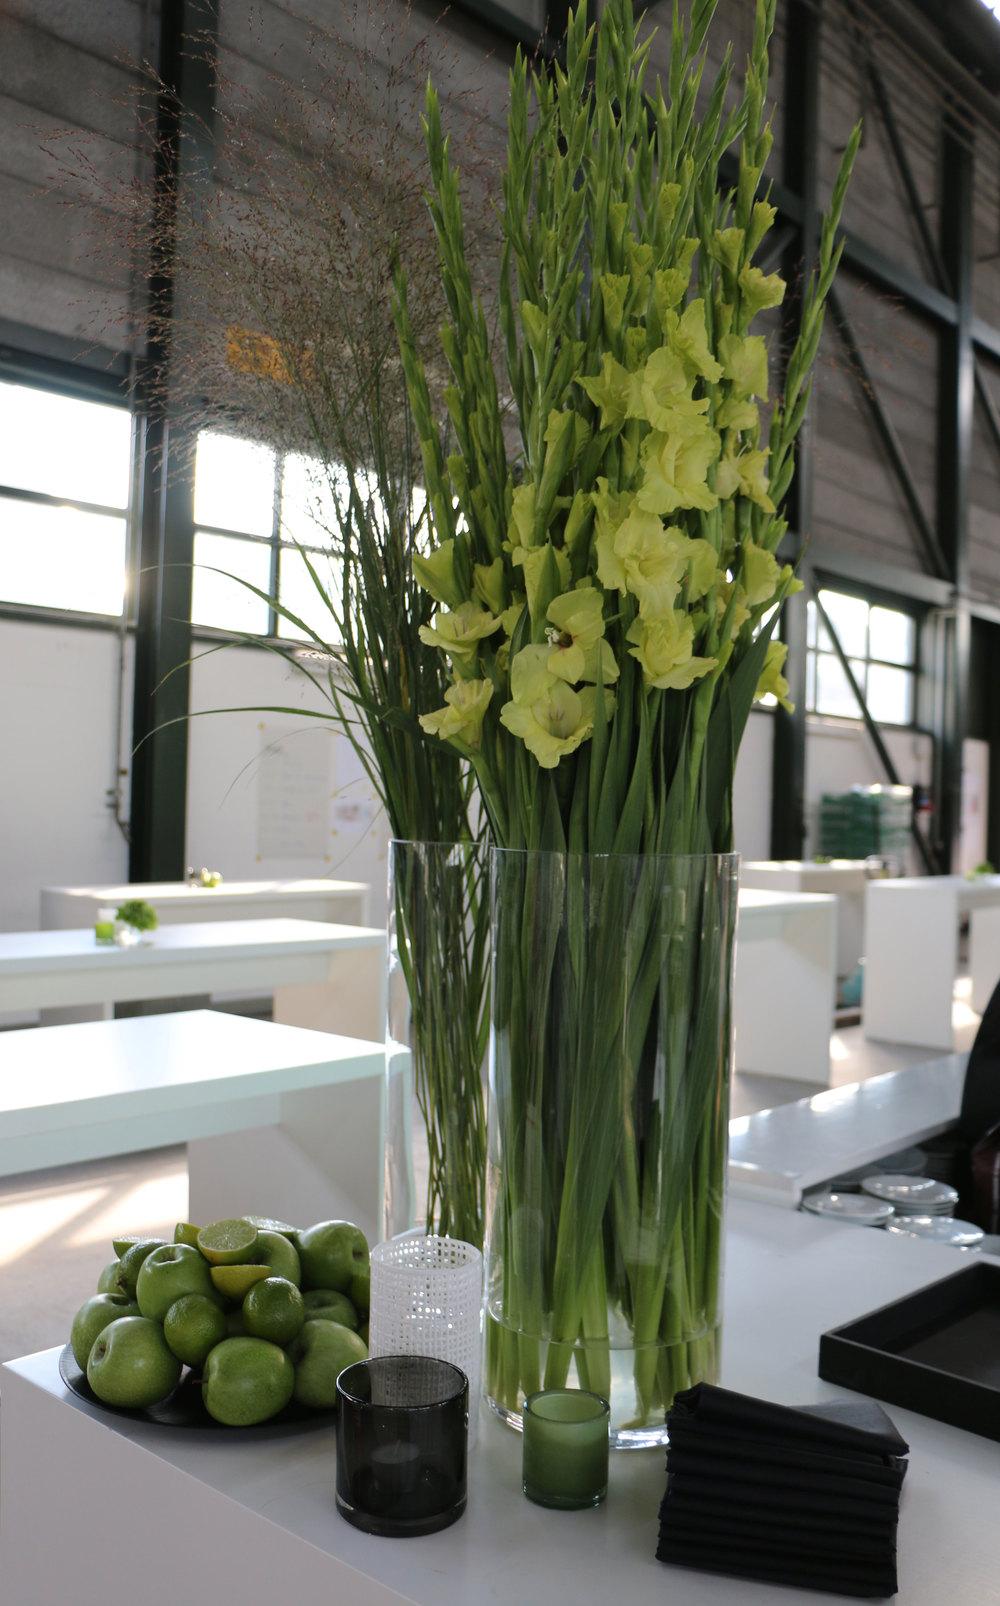 gladiolen-gruen.jpg